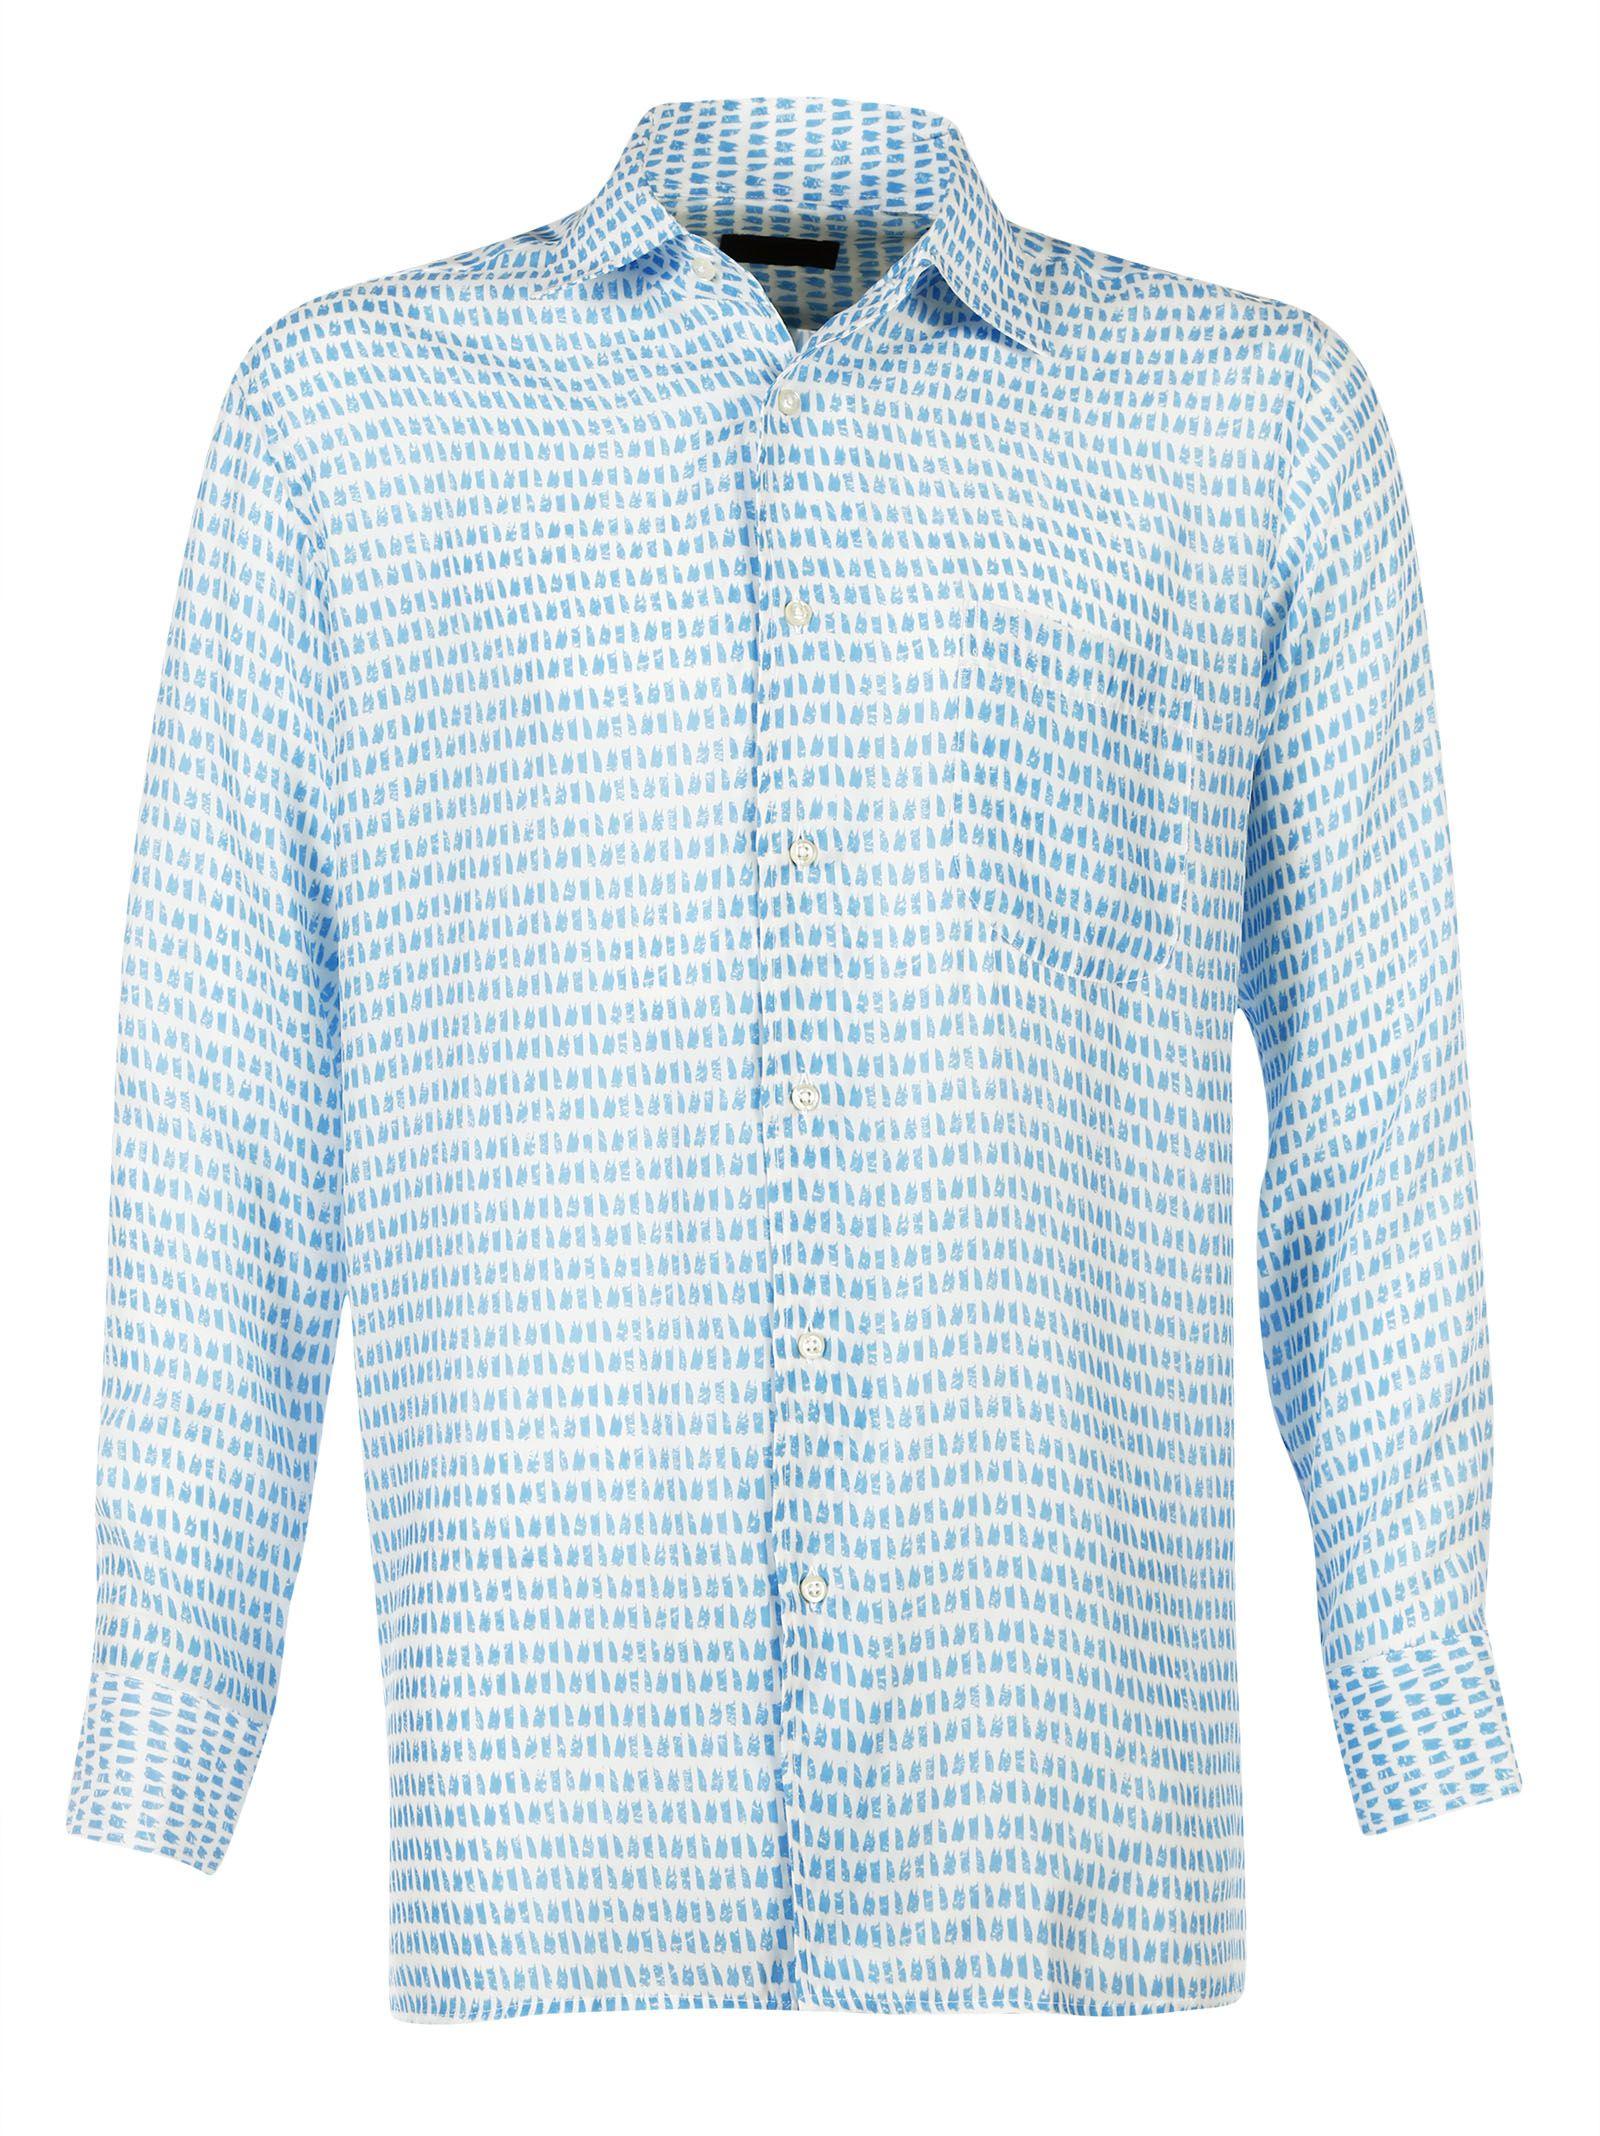 Luchino Camicie Silk Casacca Shirt